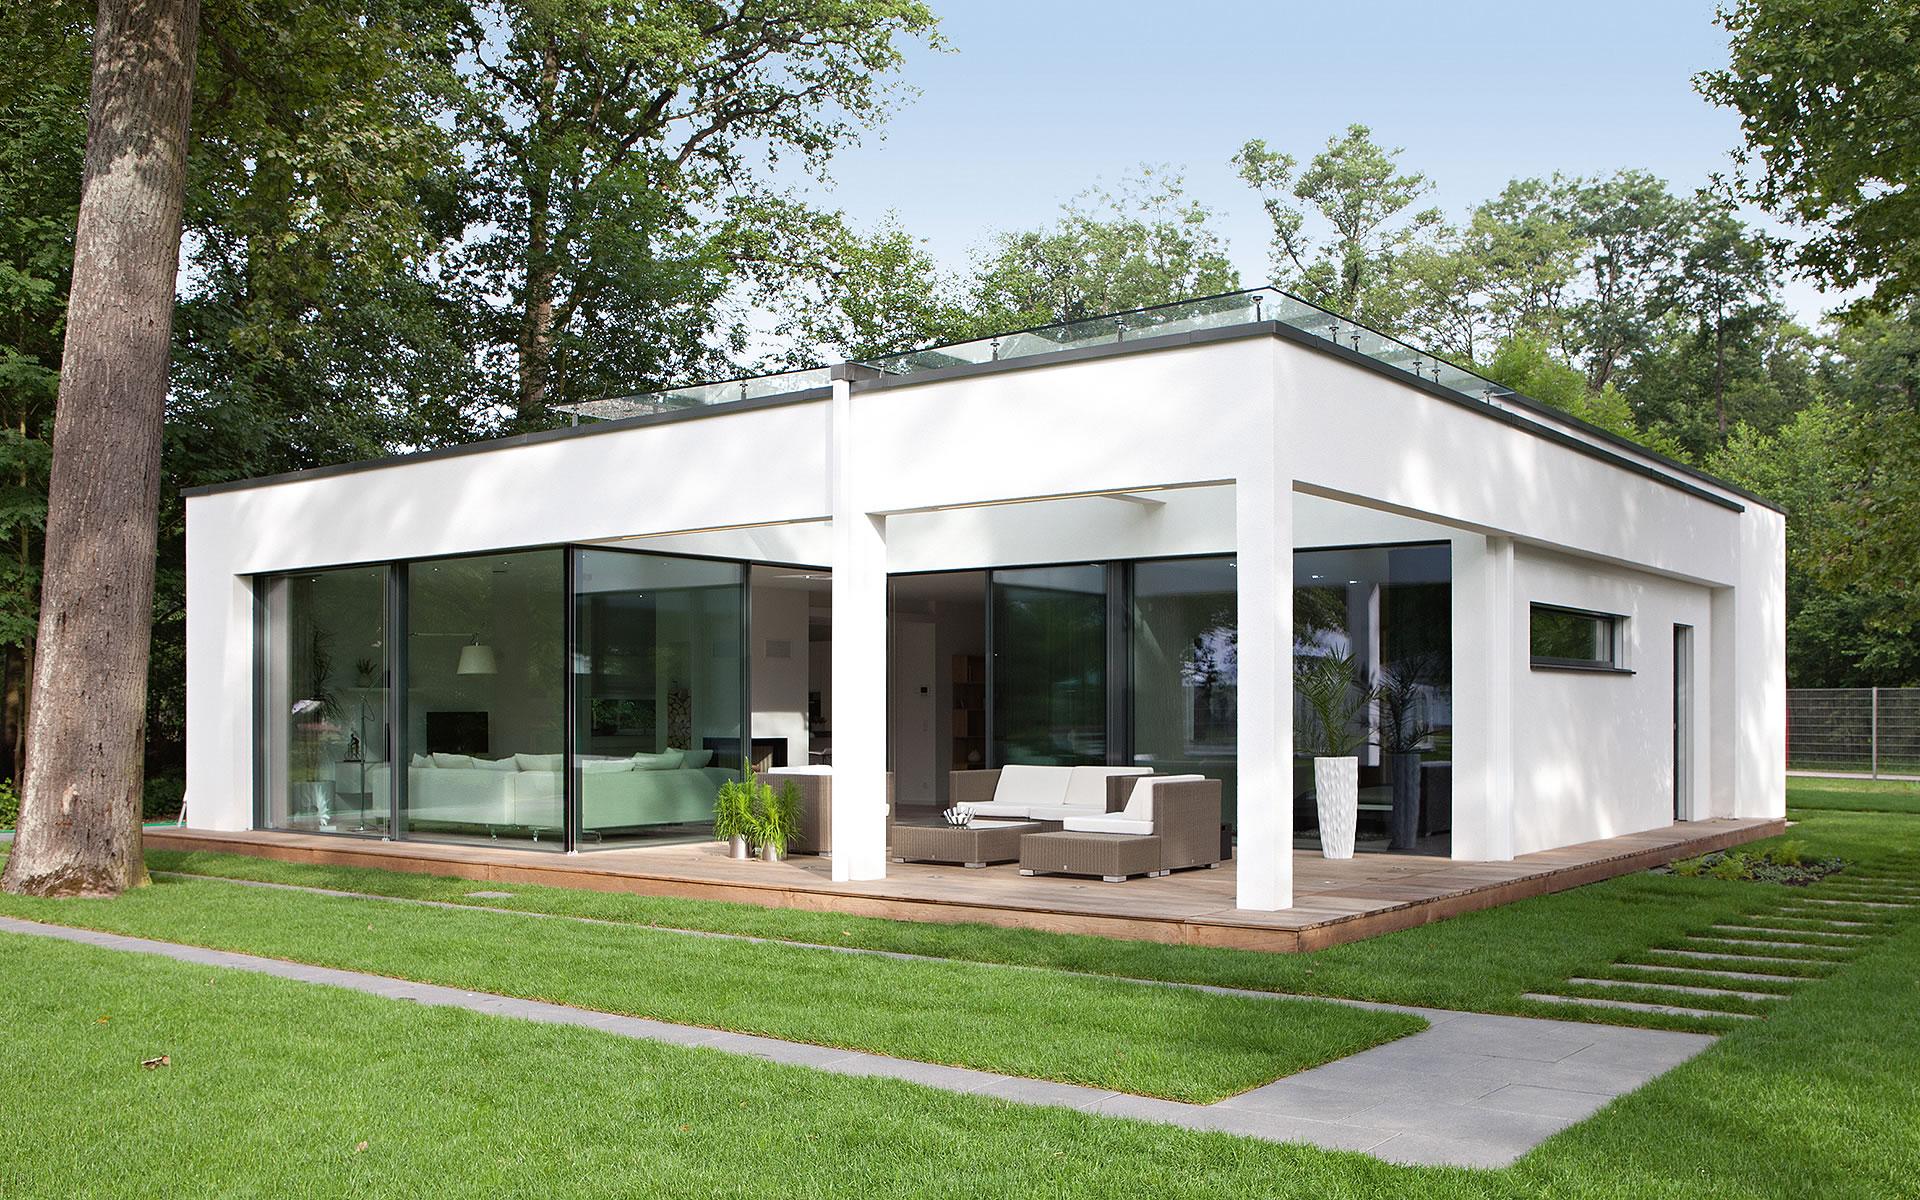 Musterhaus Rheinau-Linx (ebenLeben) - WeberHaus GmbH & Co. KG